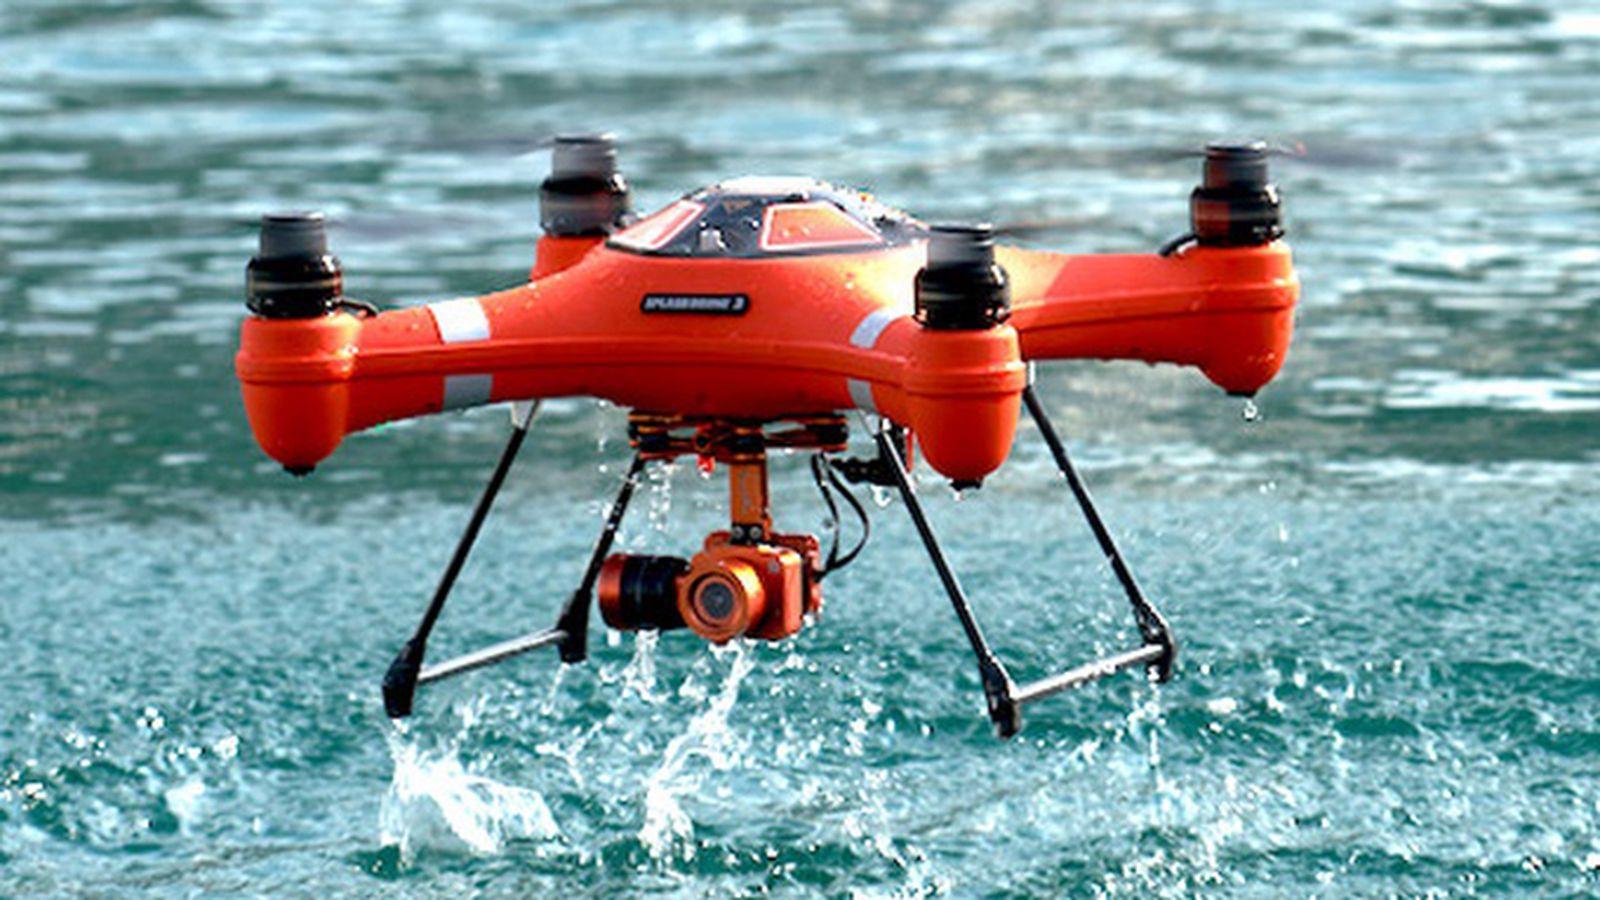 The Splash Drone 3 is the Aquaman of drones